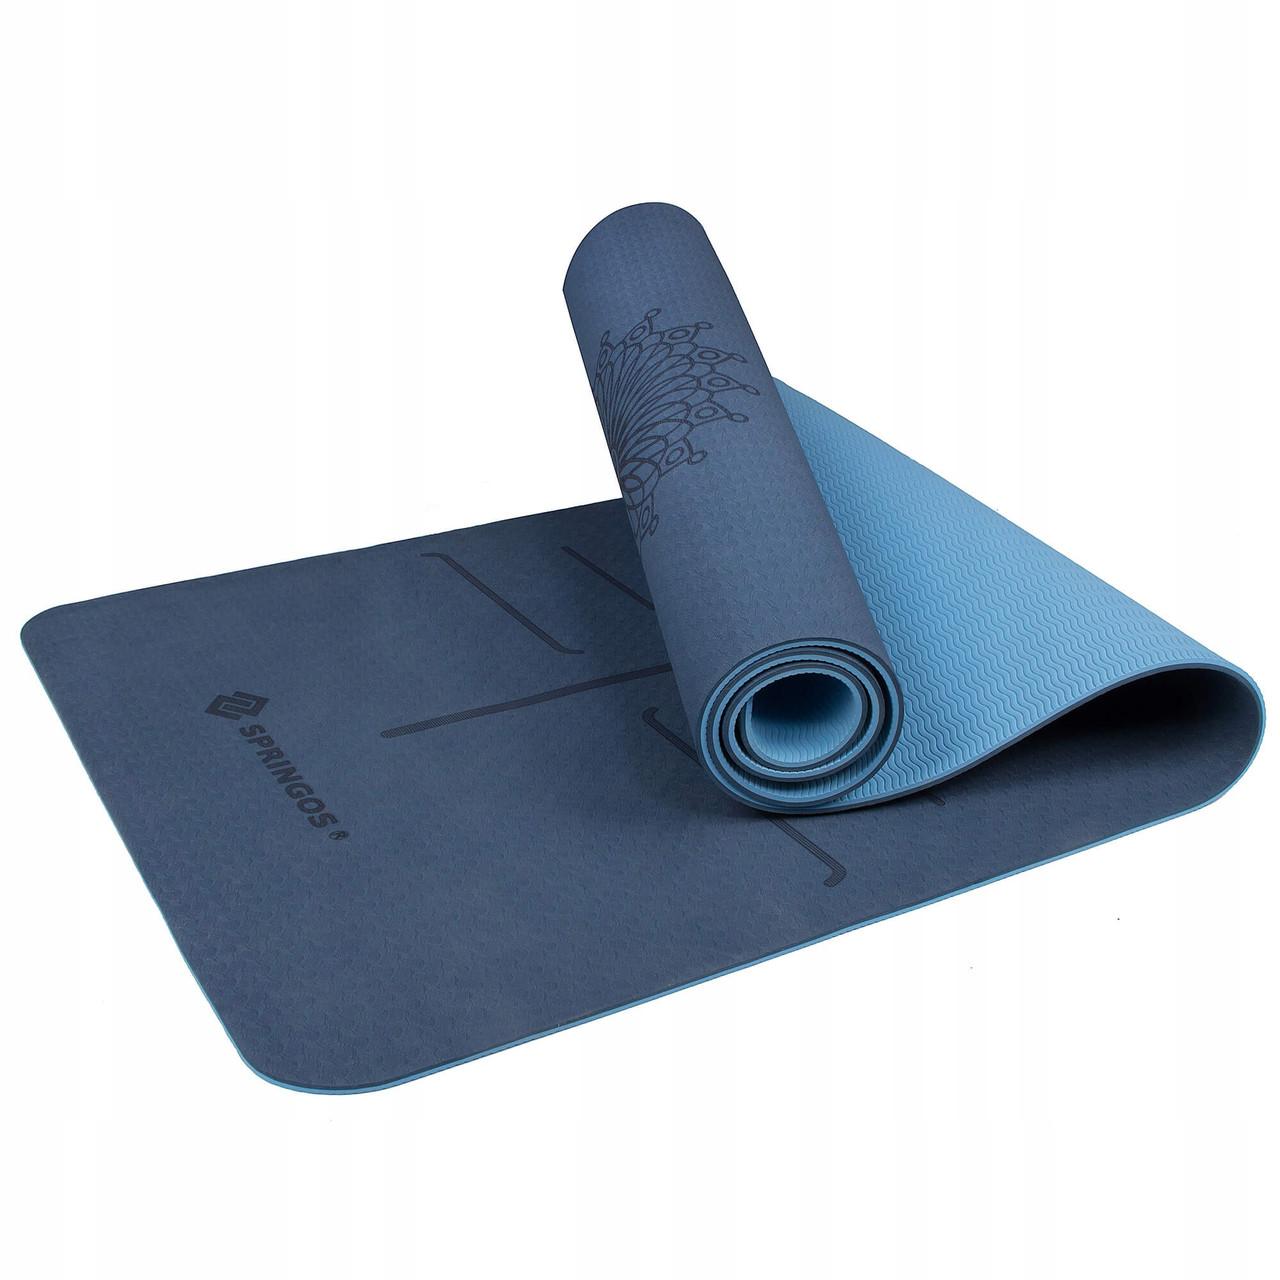 Коврик (мат) для йоги та фітнесу Springos TPE 6 мм YG0012 Blue/Sky Blue